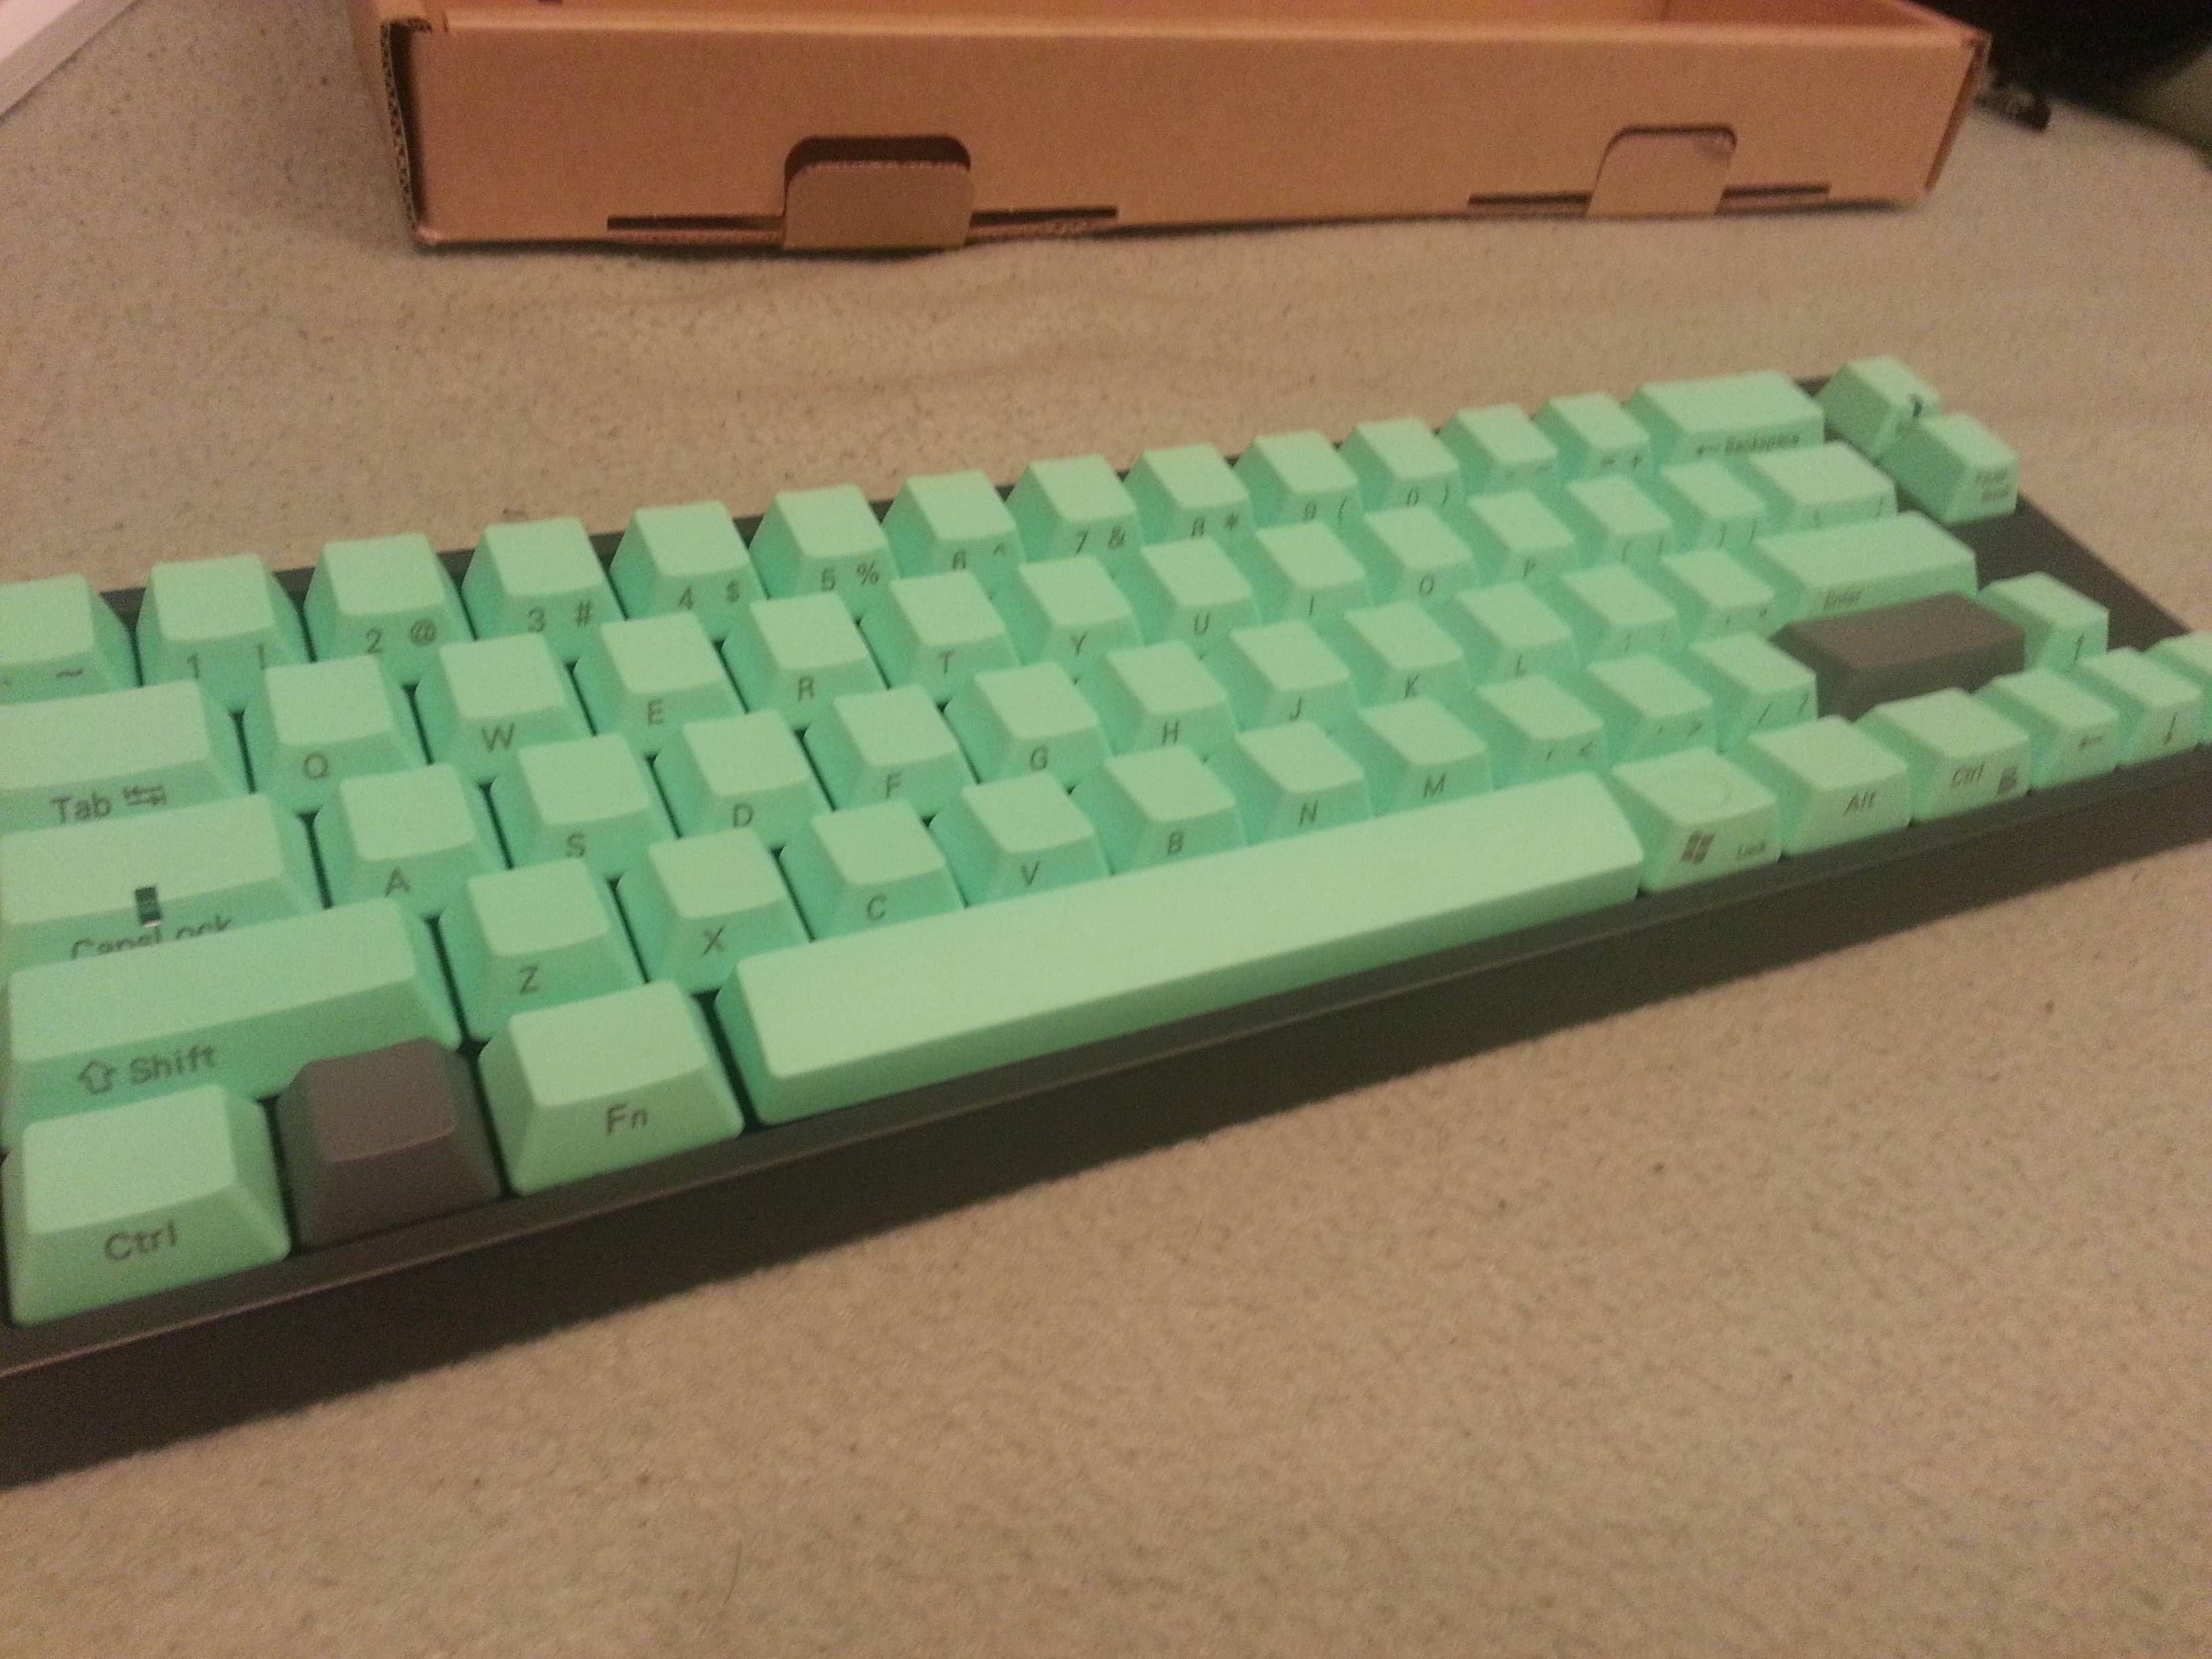 de33f884e9c Leopold FC660M | Mechanical keyboards, further inspiration ...